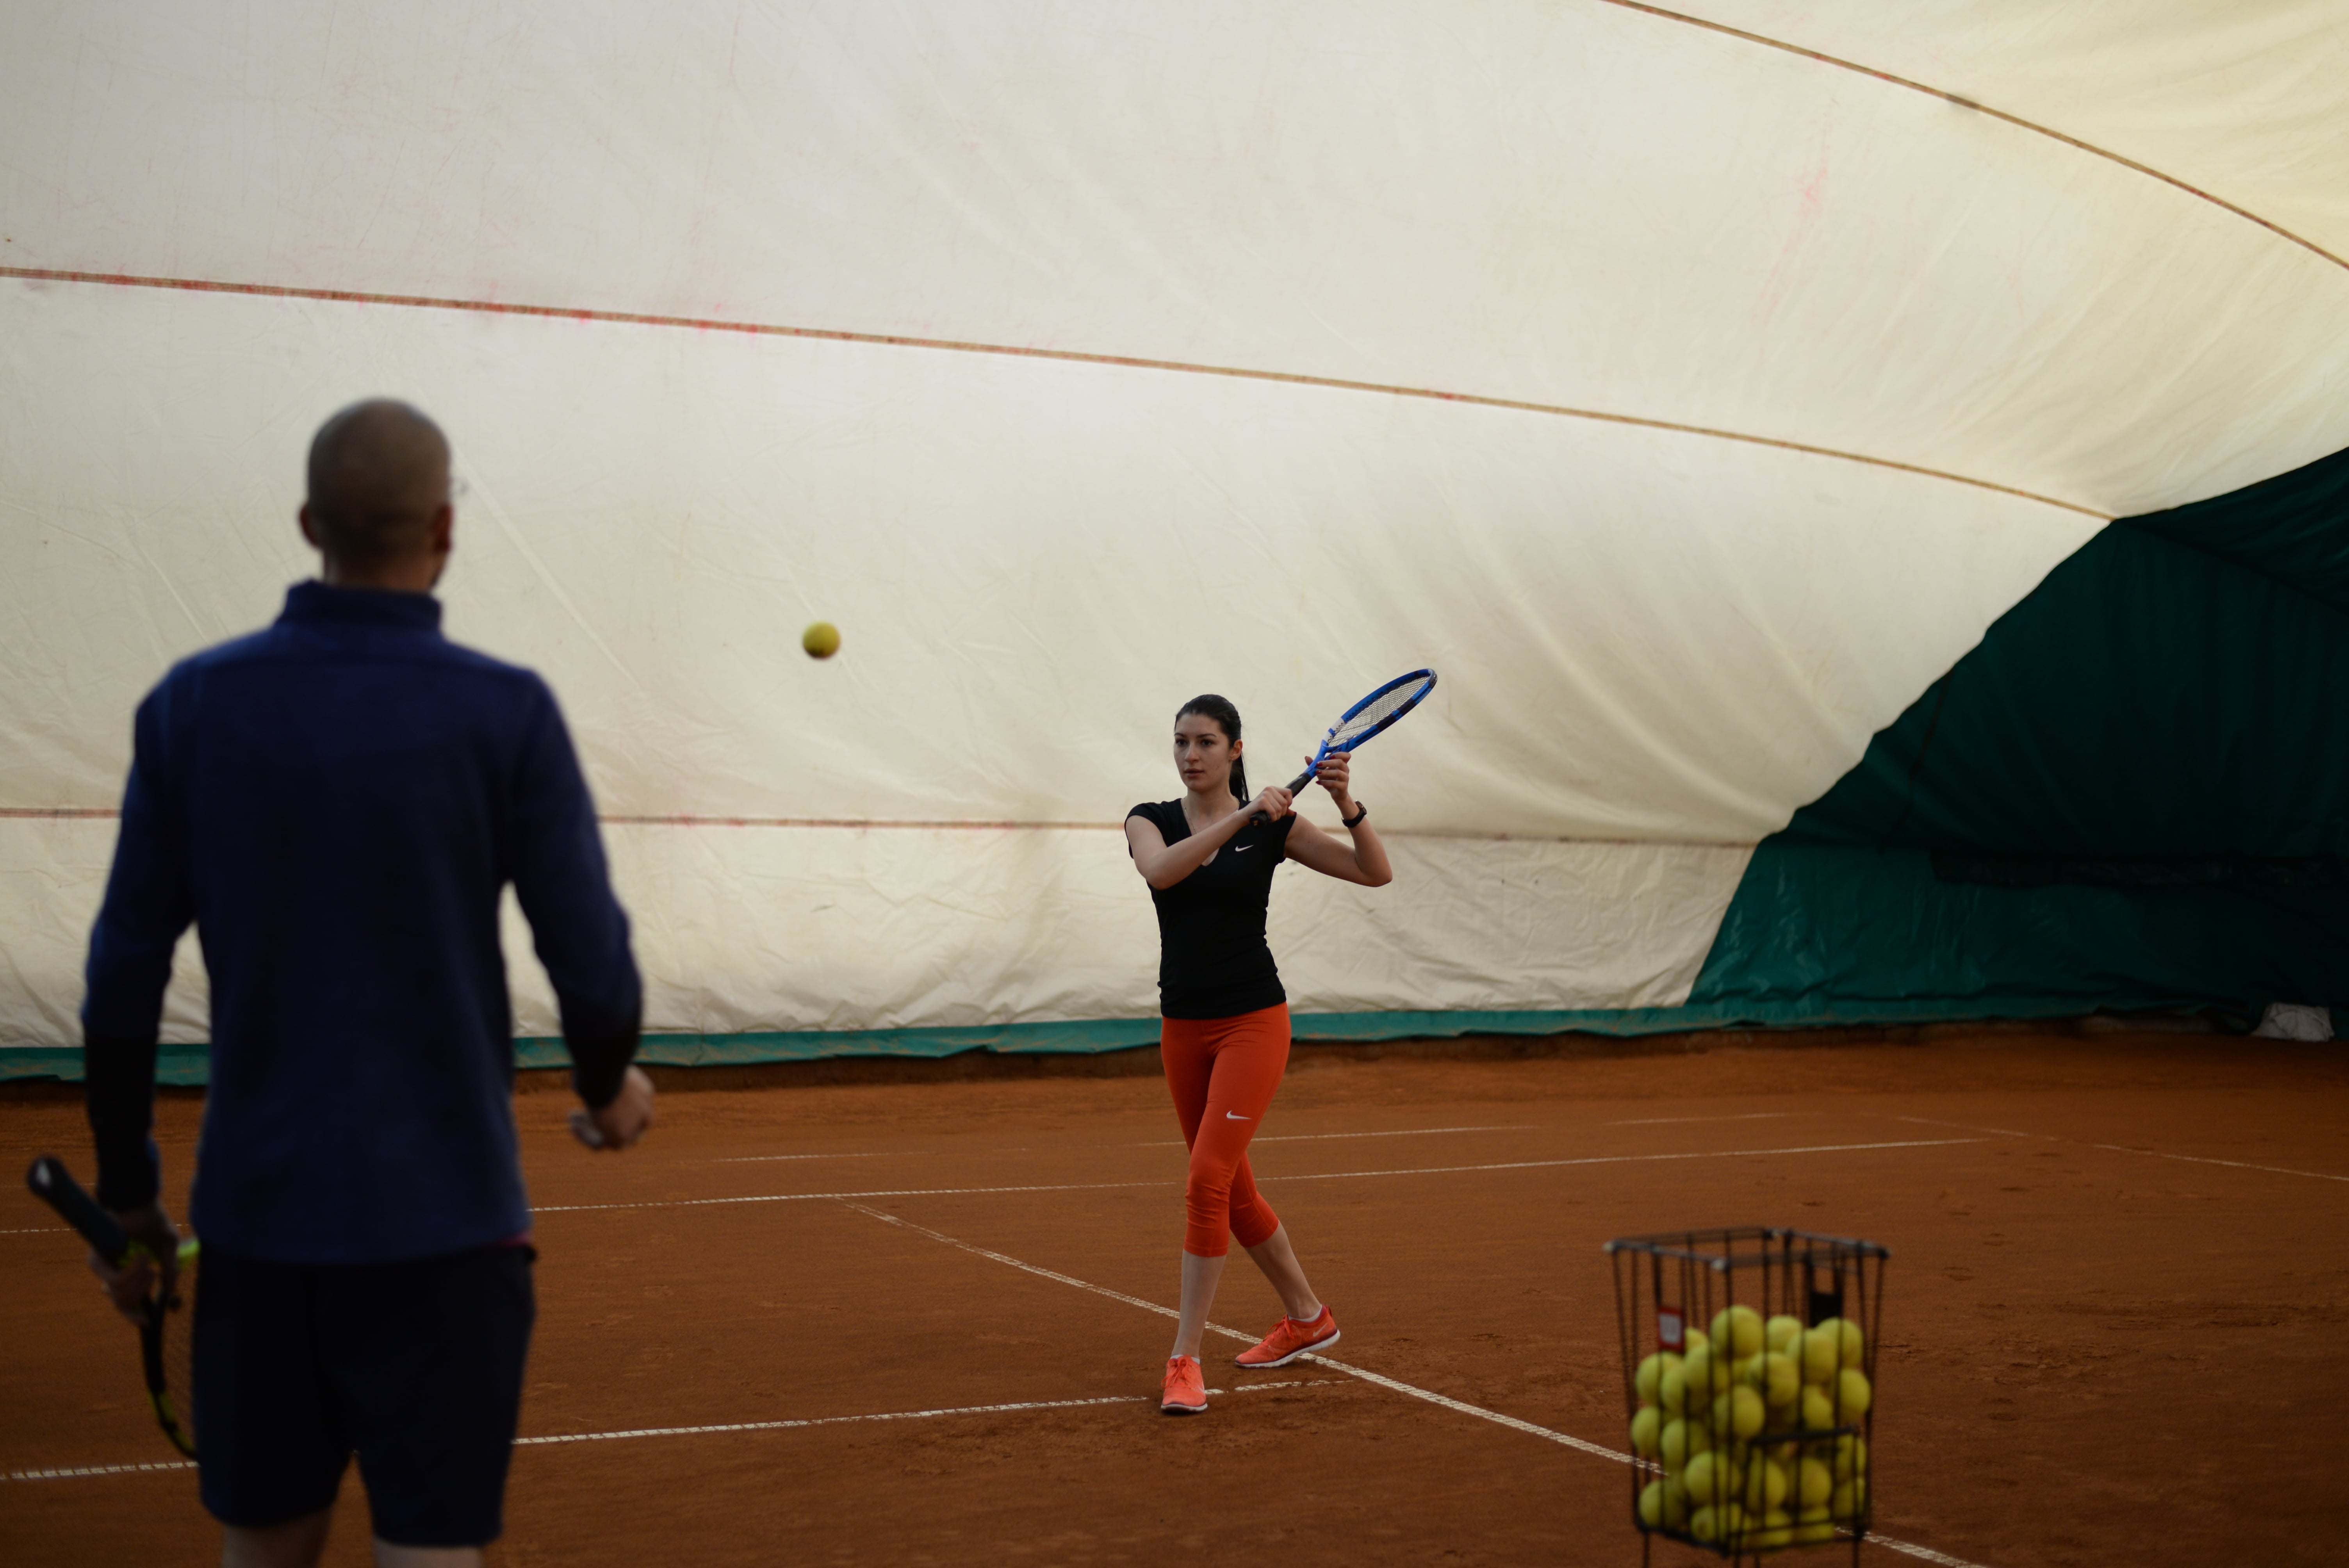 уроки тенниса для начинающих